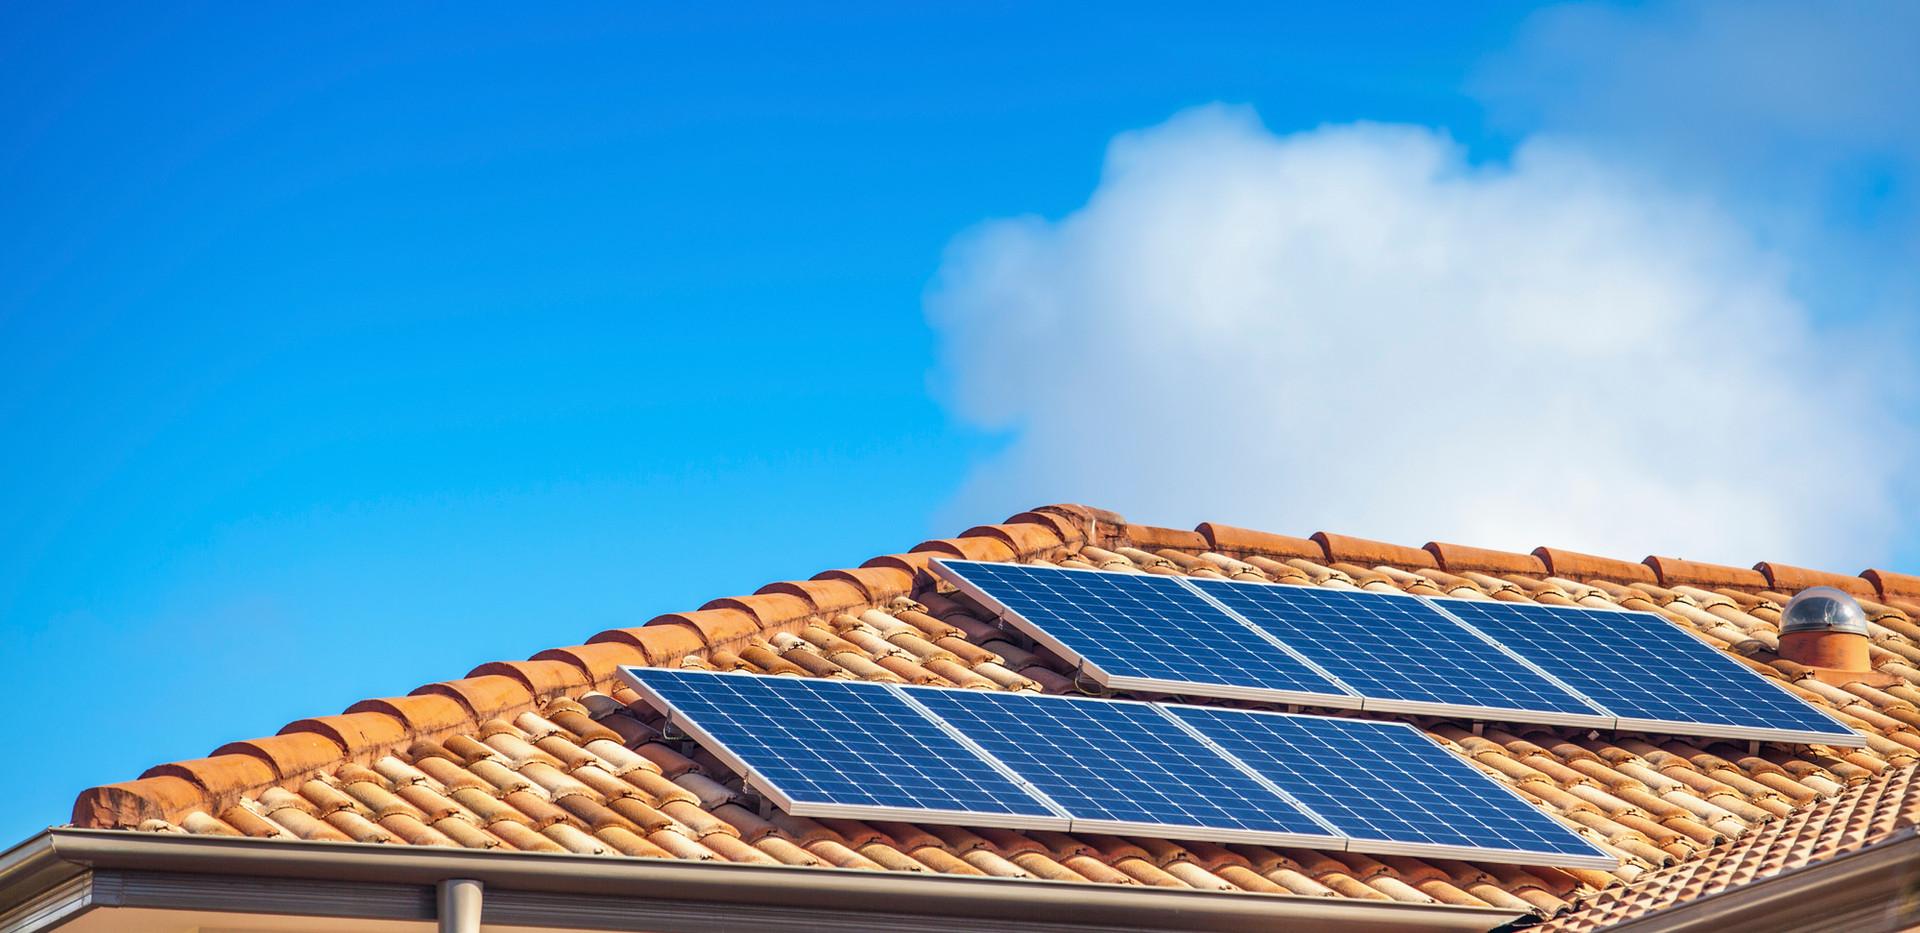 Canva - Solar panels on home.jpg